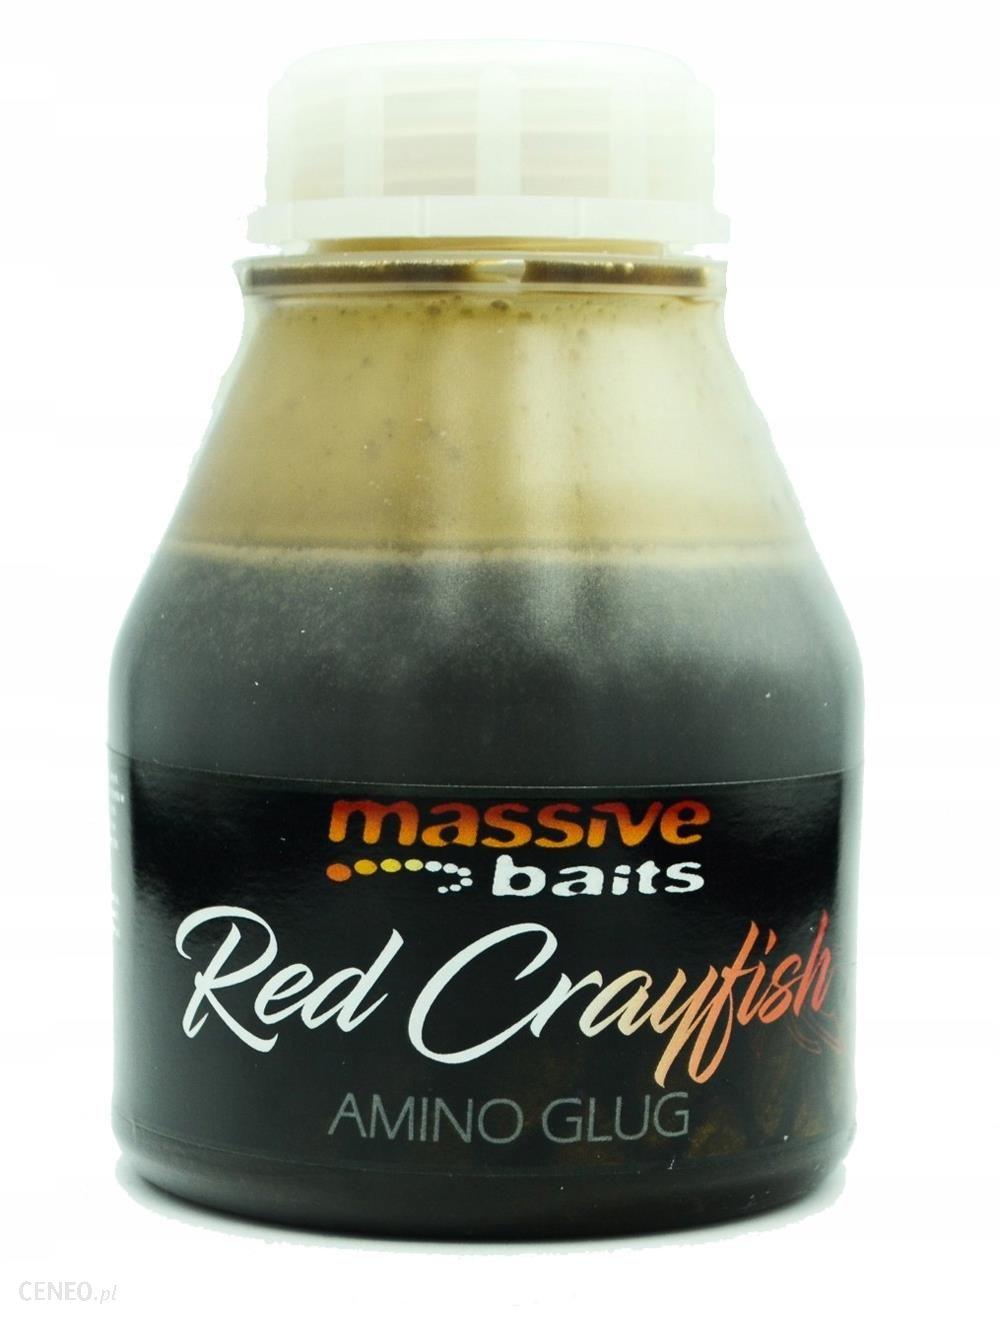 MASSIVE BAITS AMINO GLUG RED CRAYFISH 250ML